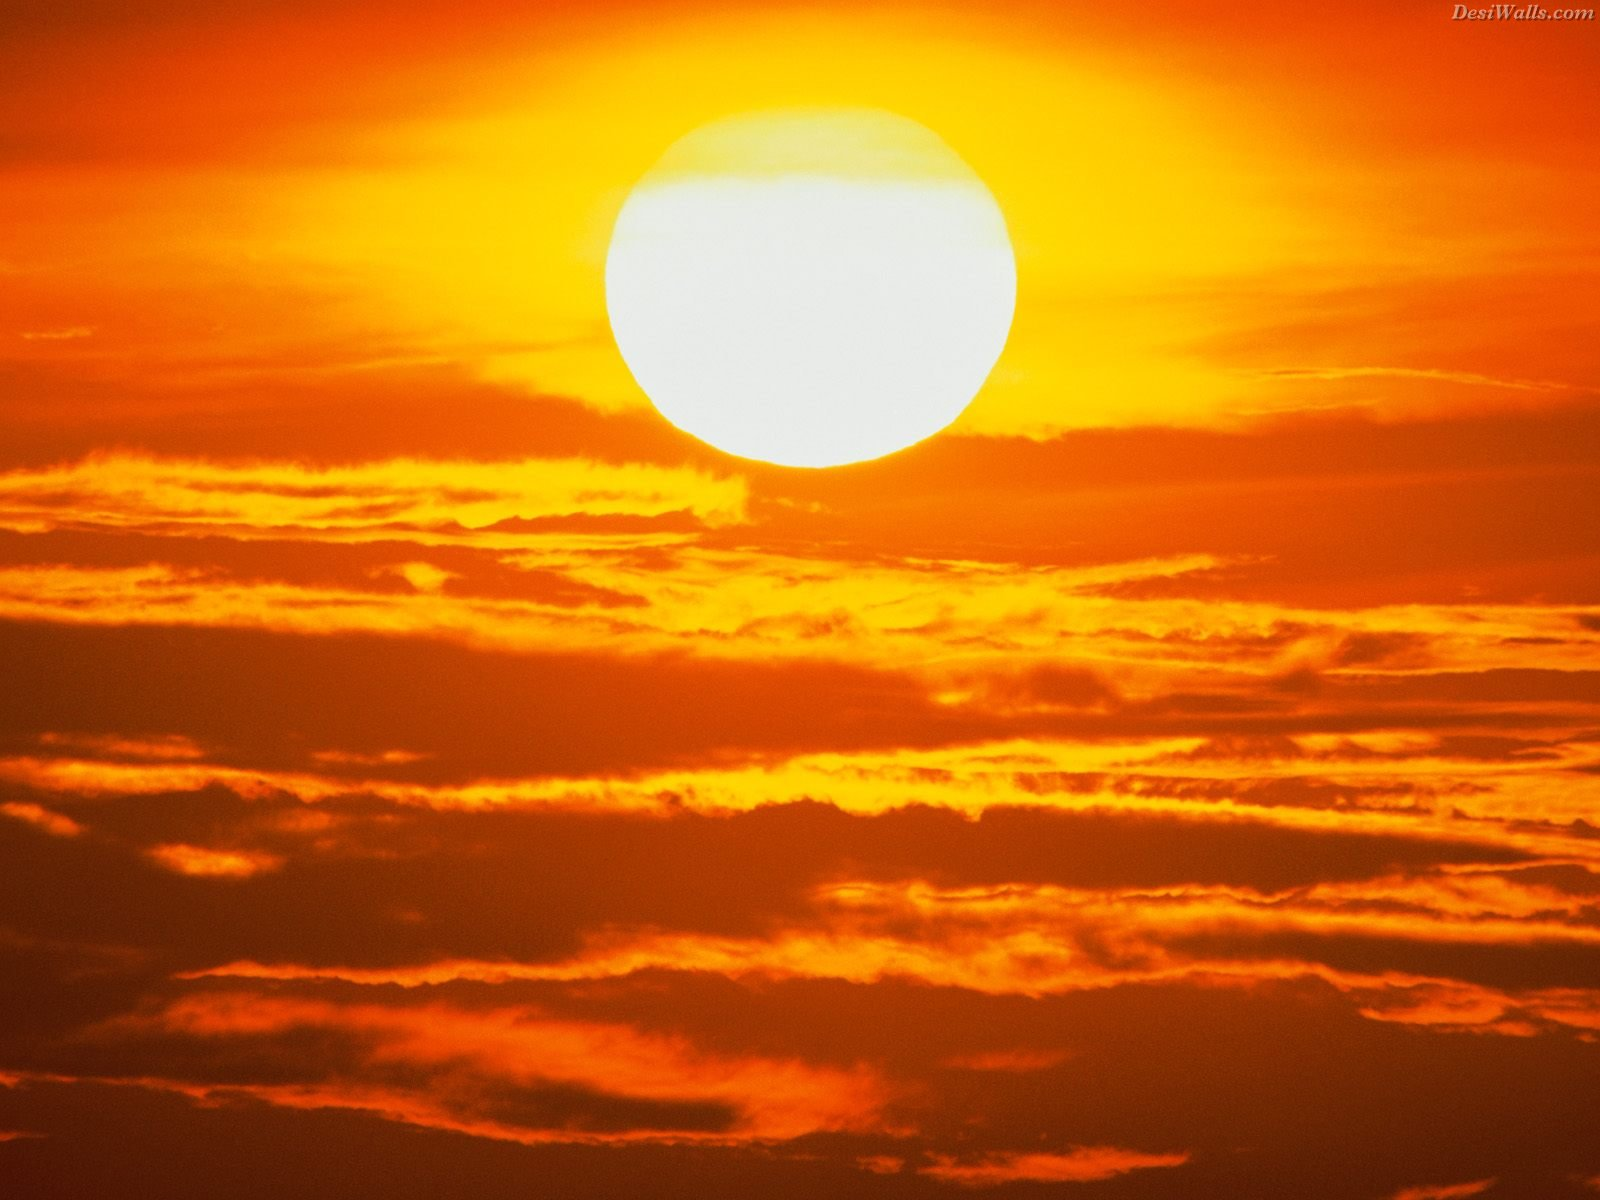 Free Sun Wallpaper 22623 1920x1200 px